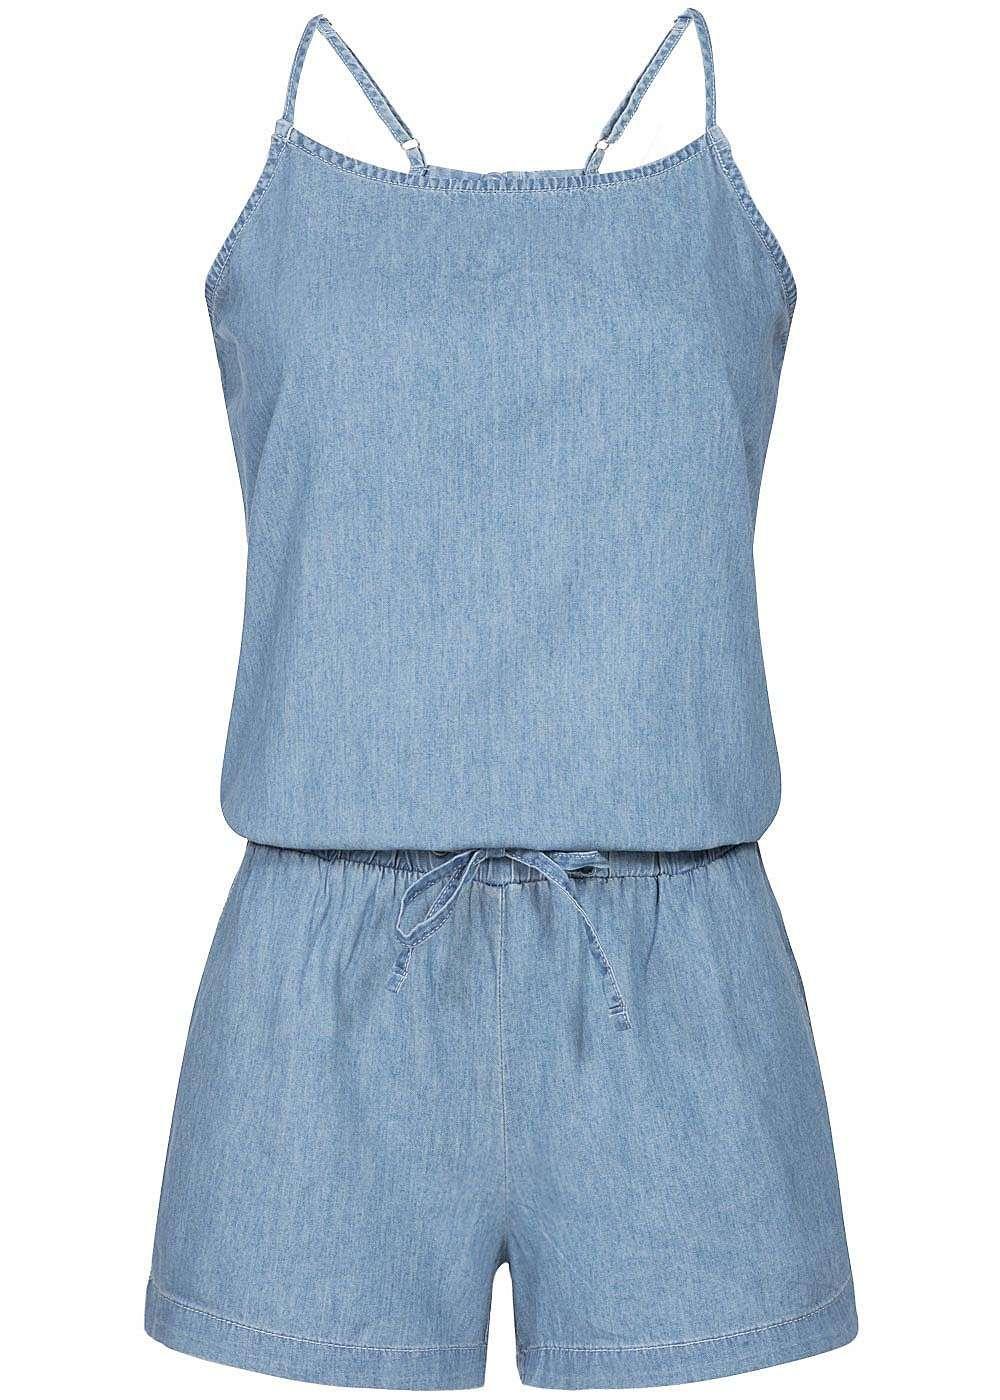 51b9caa8ddc41 Vero Moda Damen Jumpsuit ärmellos Kordelzug 2 Taschen light blue denim -  77onlineshop